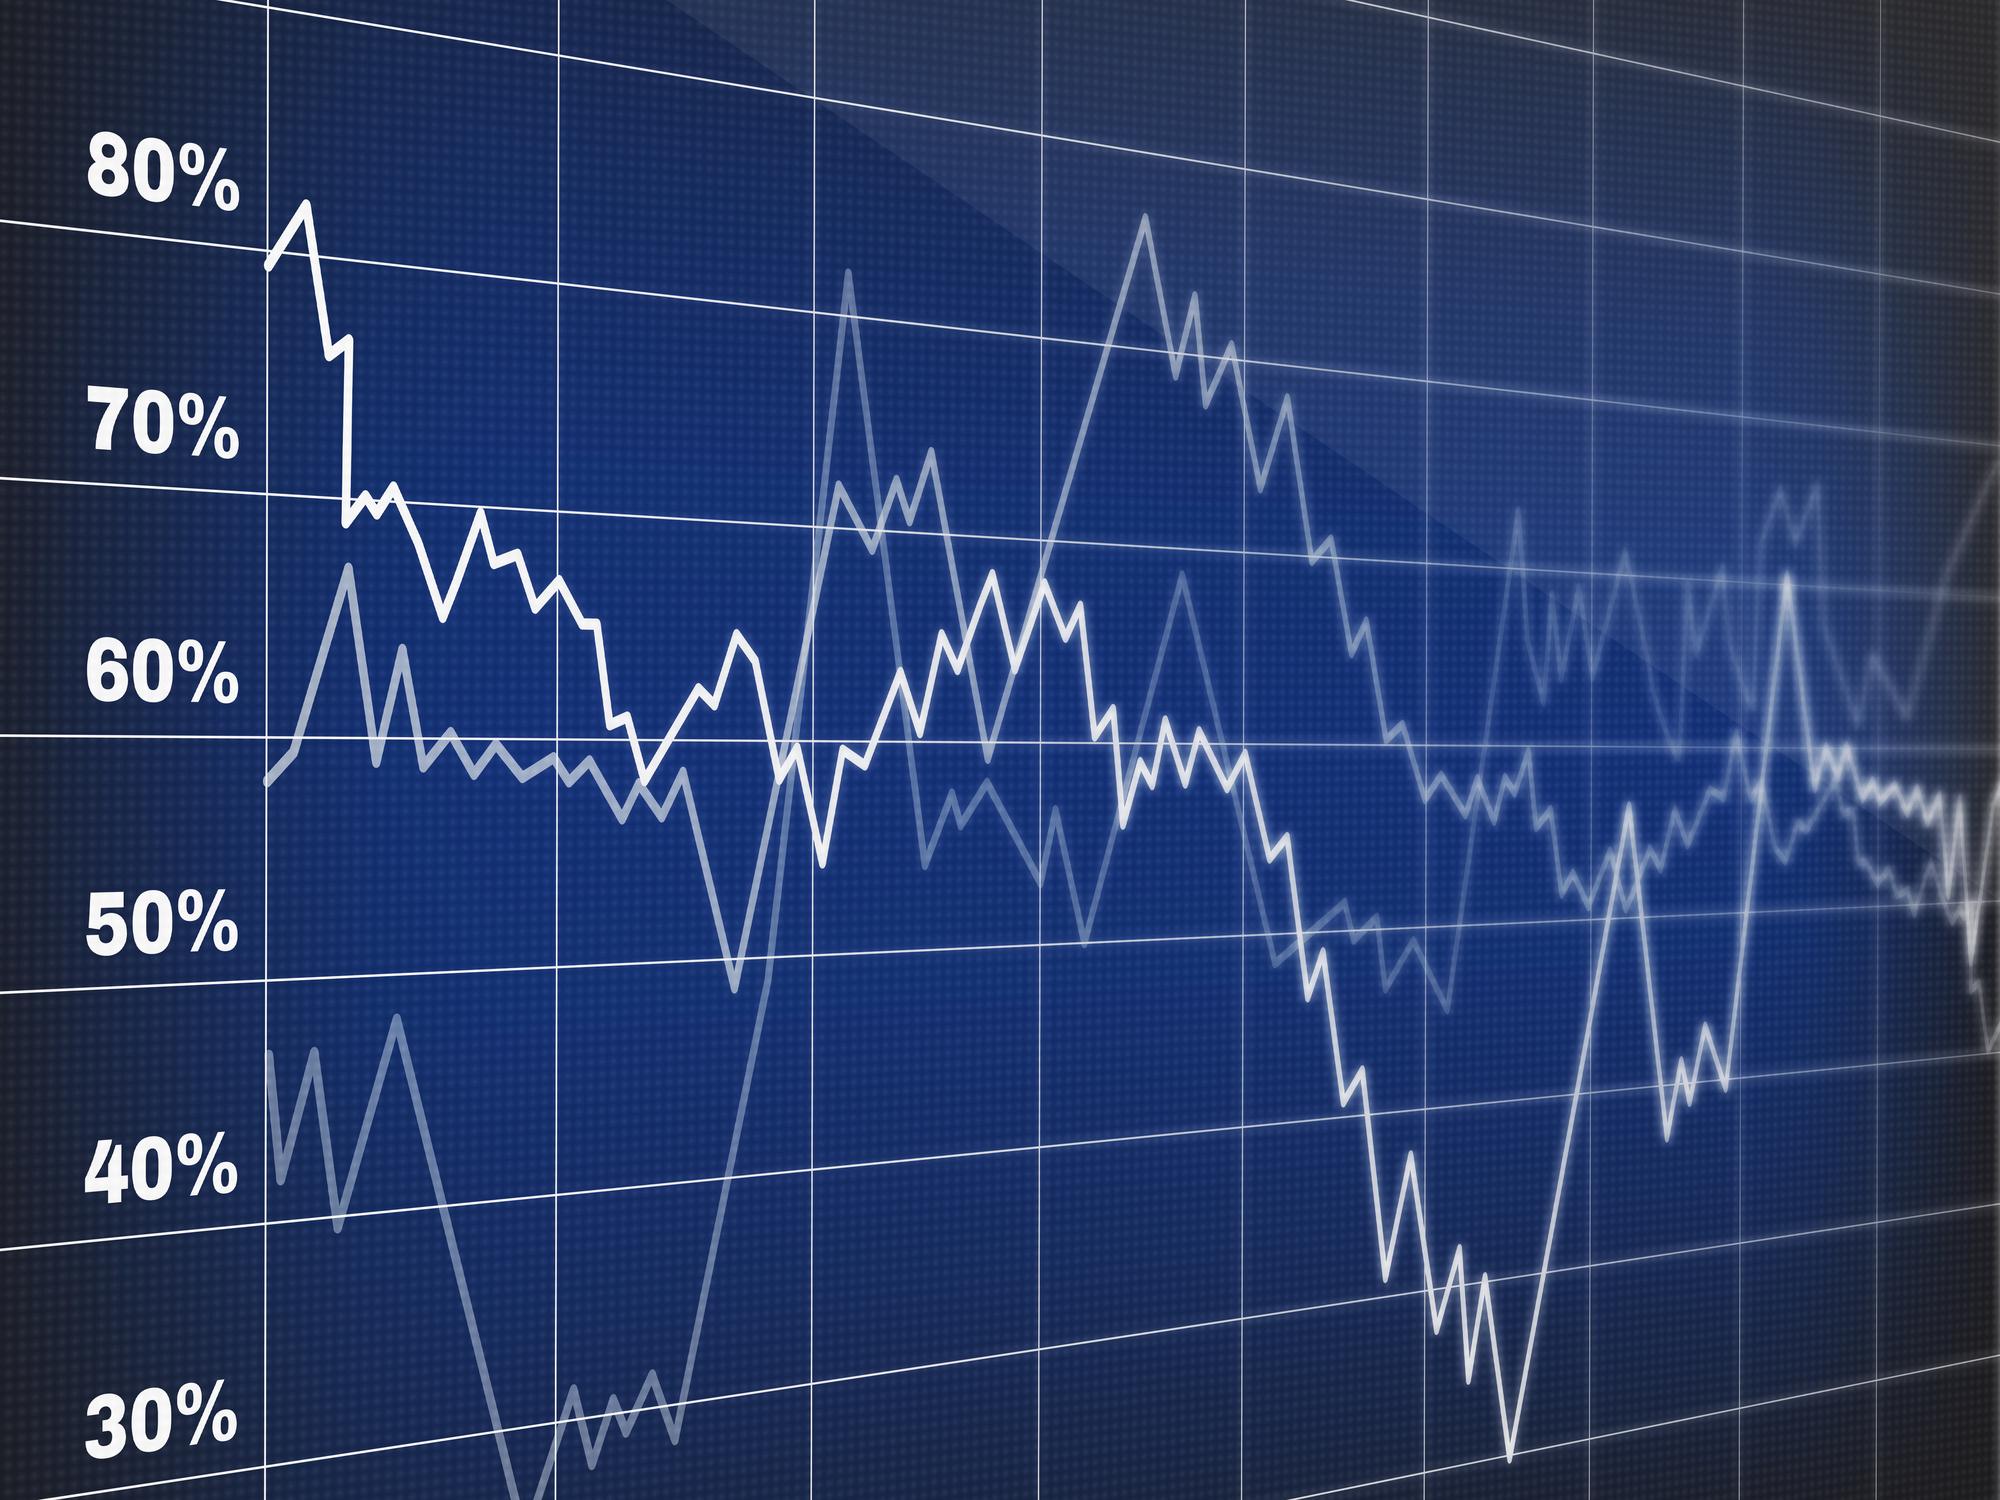 Chart of stock-market data